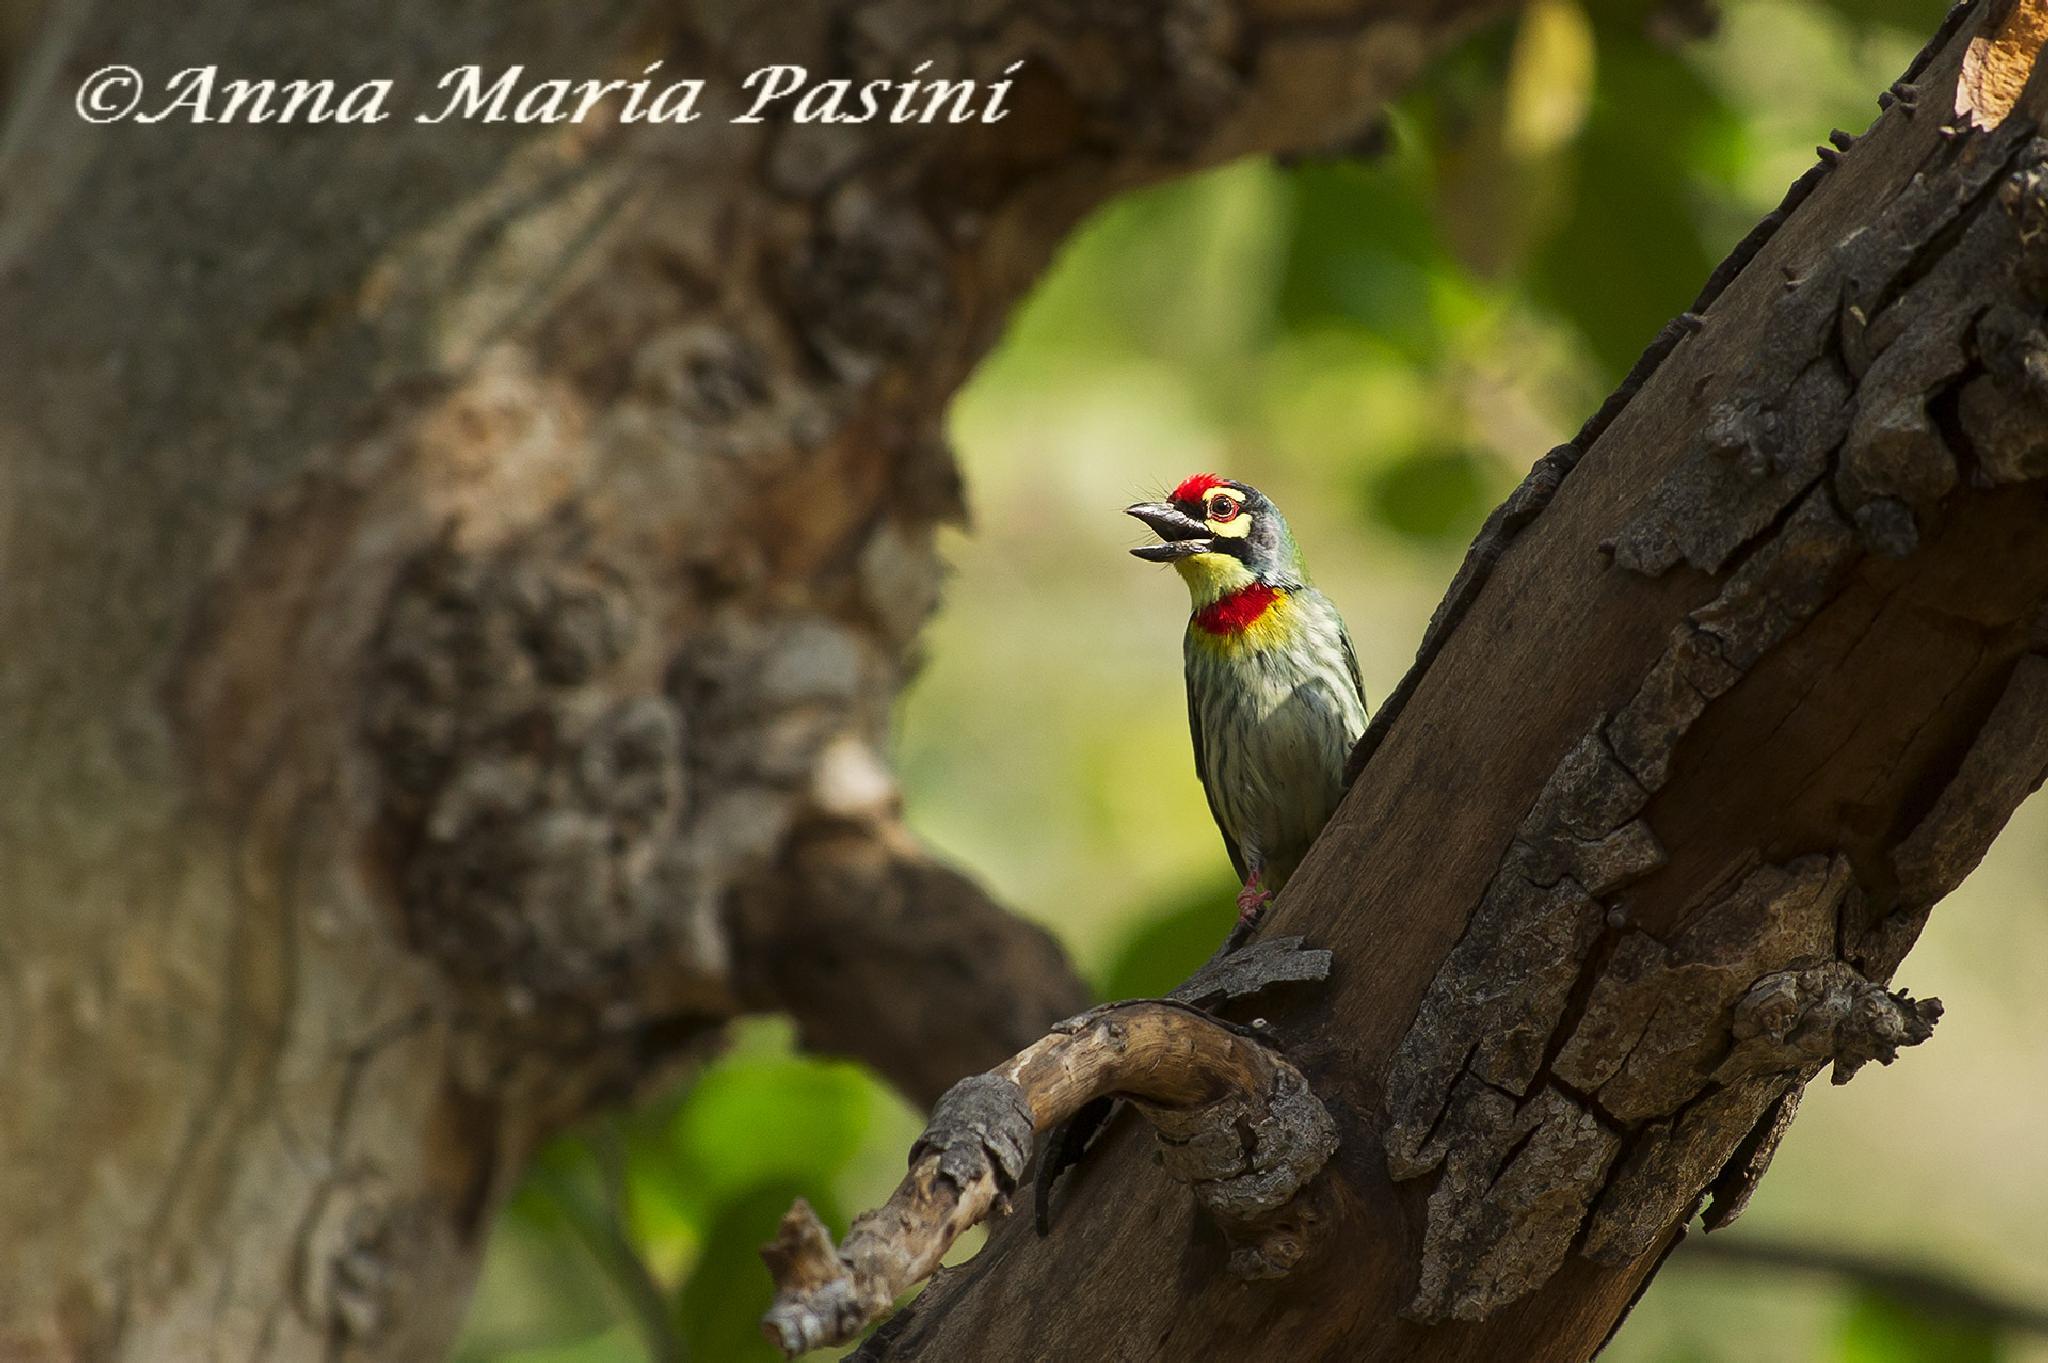 Barbuto fabbro (Psilopogon haemacephalus)-Ranthanbore N.P. by annamariapasini